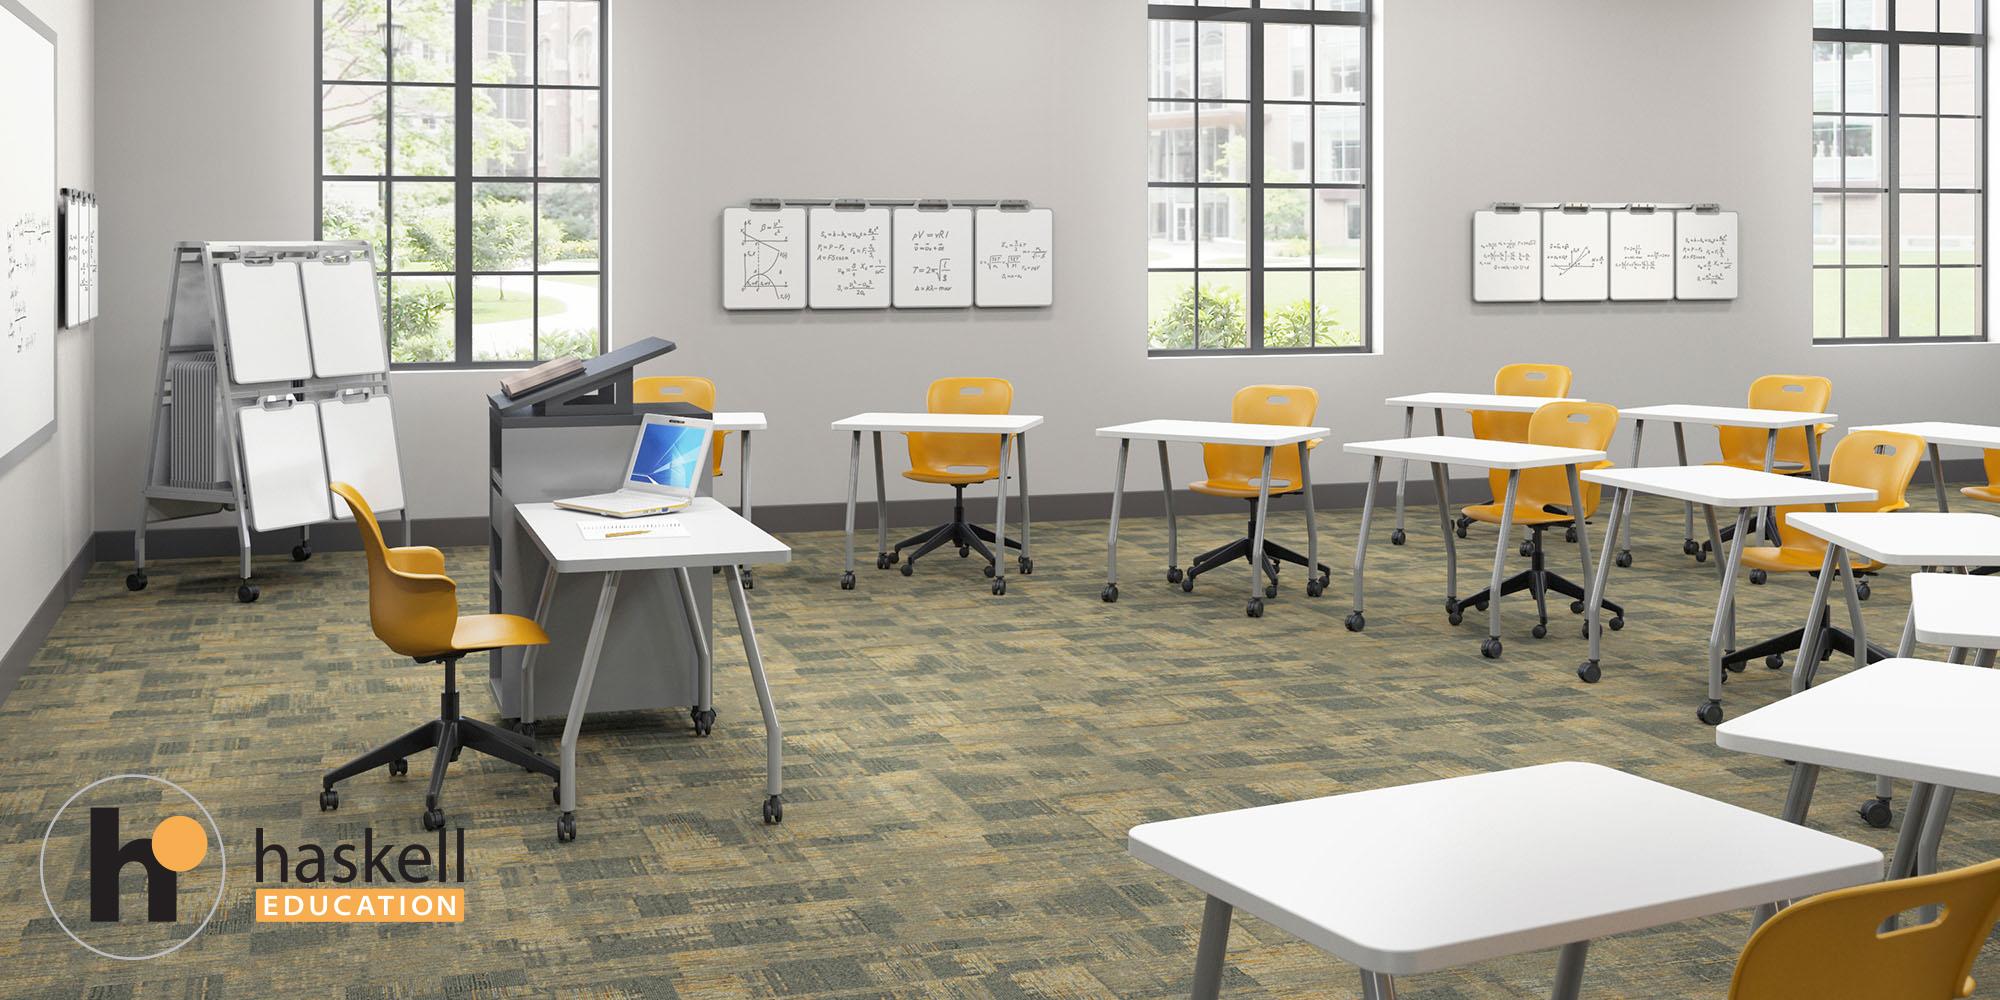 Student Desk 34x24 Classroom Distancing_edit